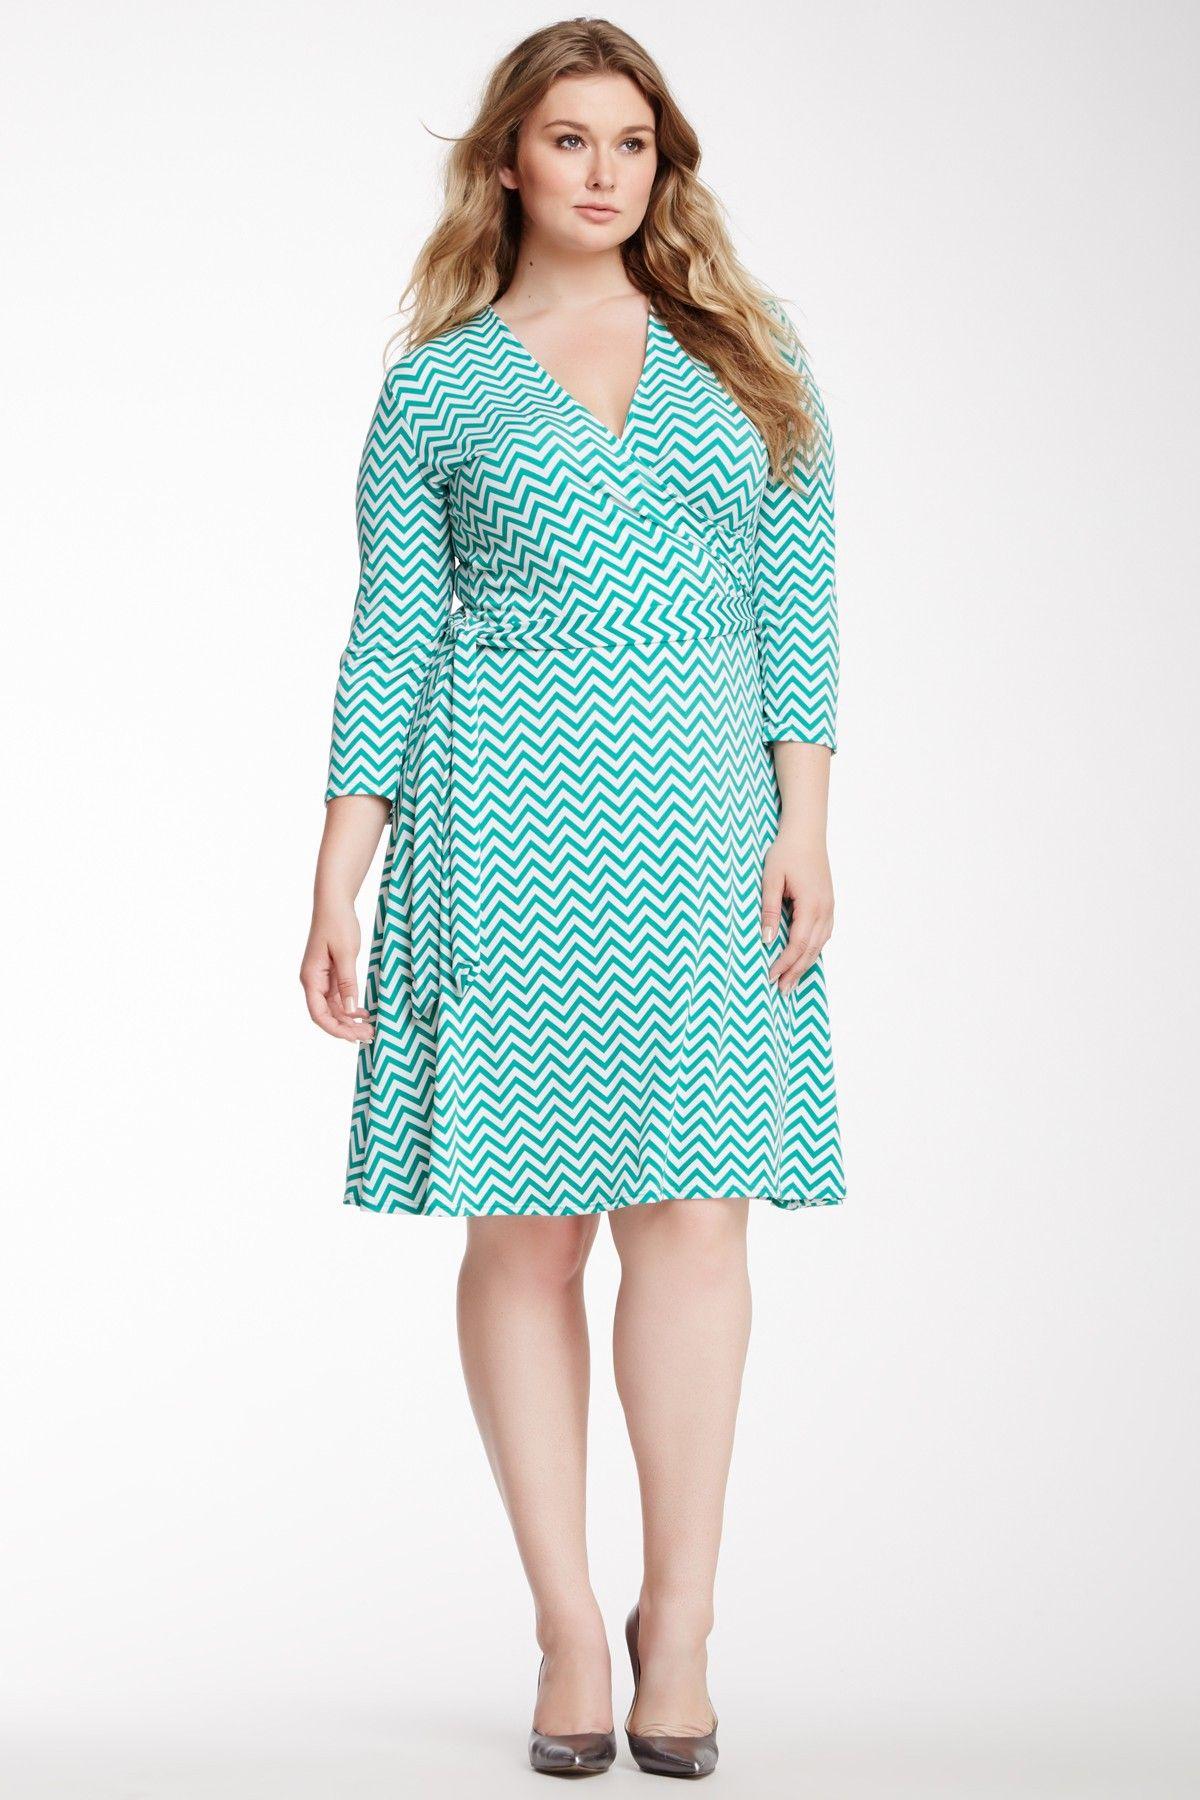 Leota The Perfect Wrap Dress - Plus Size